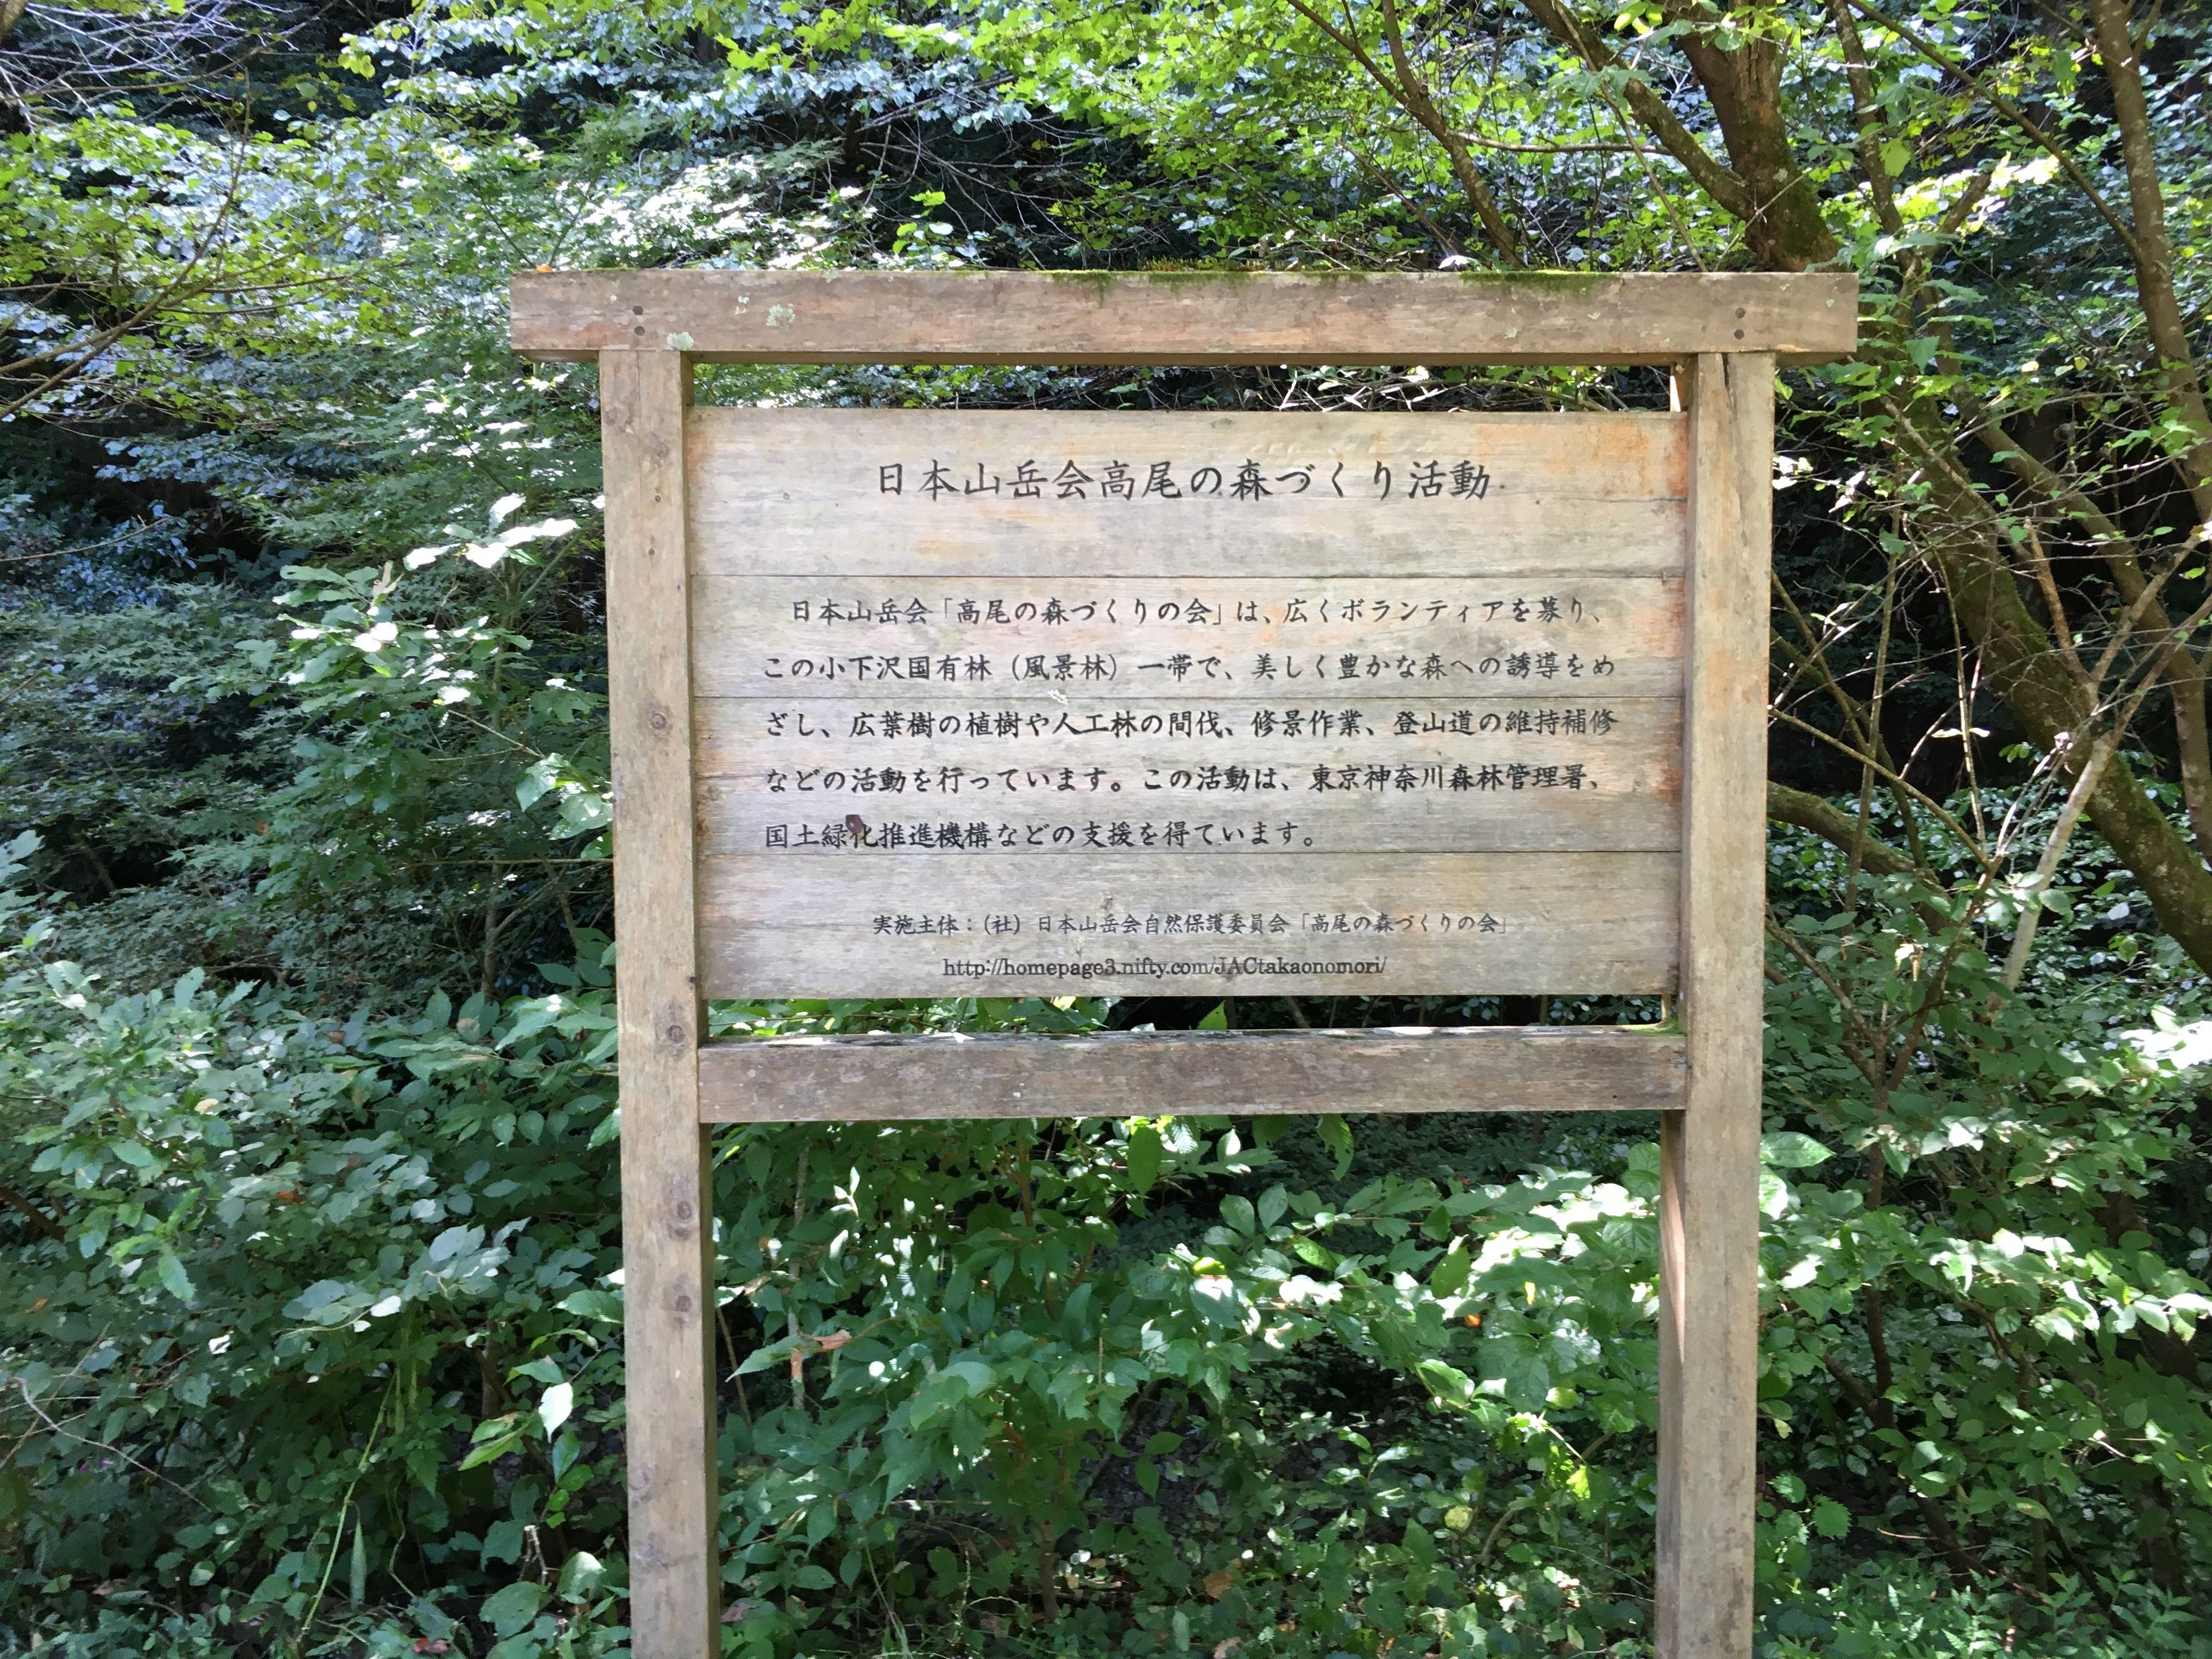 高尾の森作業小屋